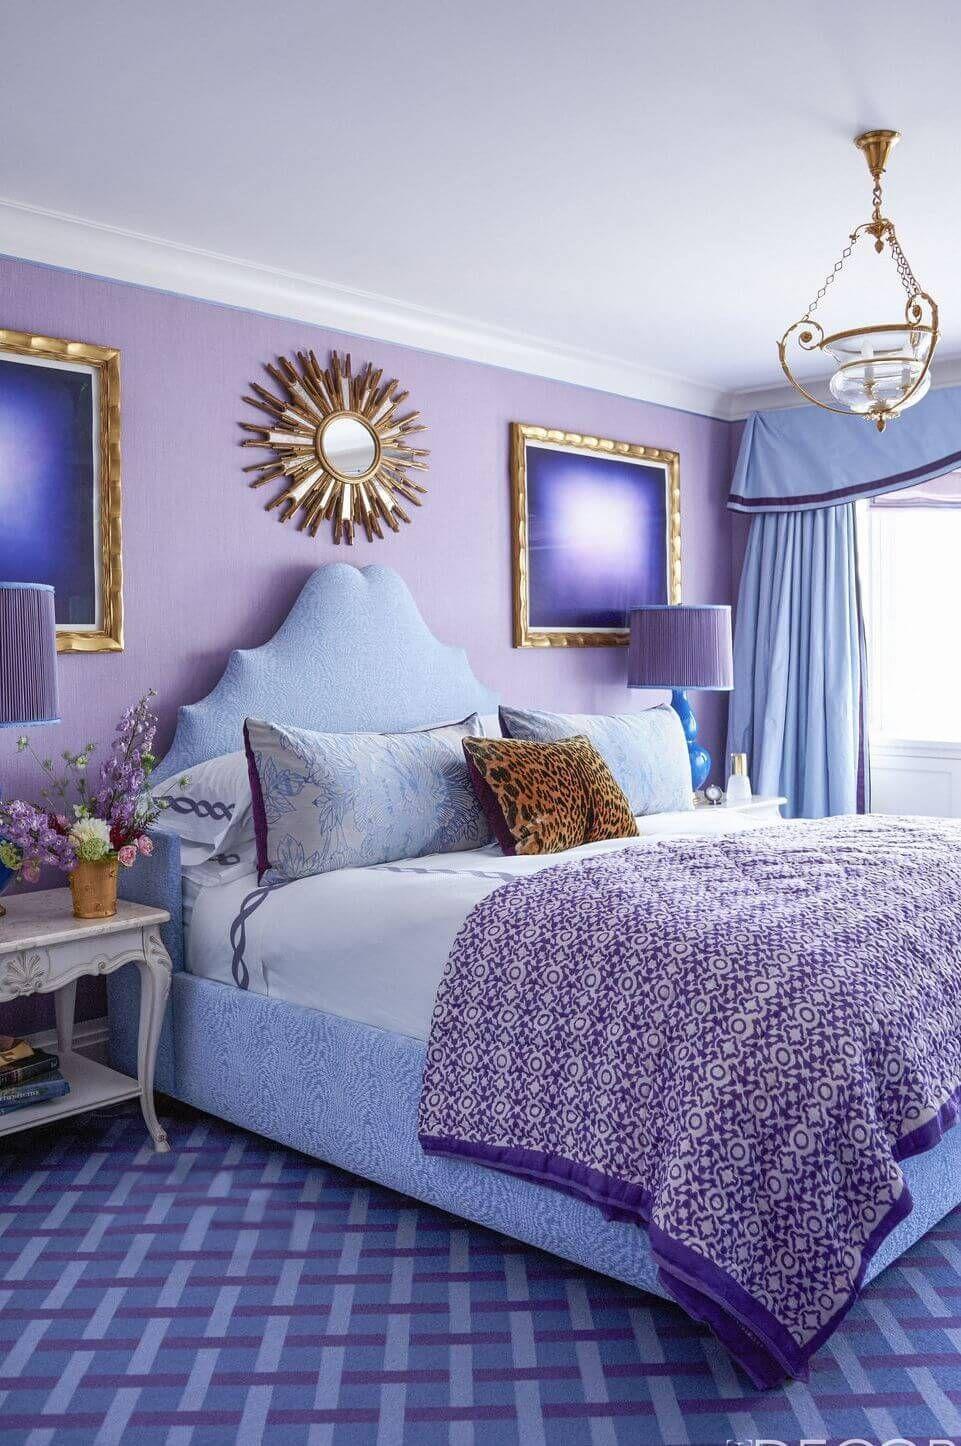 10 Purple Bedroom Ideas 2021 Chic And Bold Purple Bedroom Decor Purple Bedrooms Light Purple Bedrooms